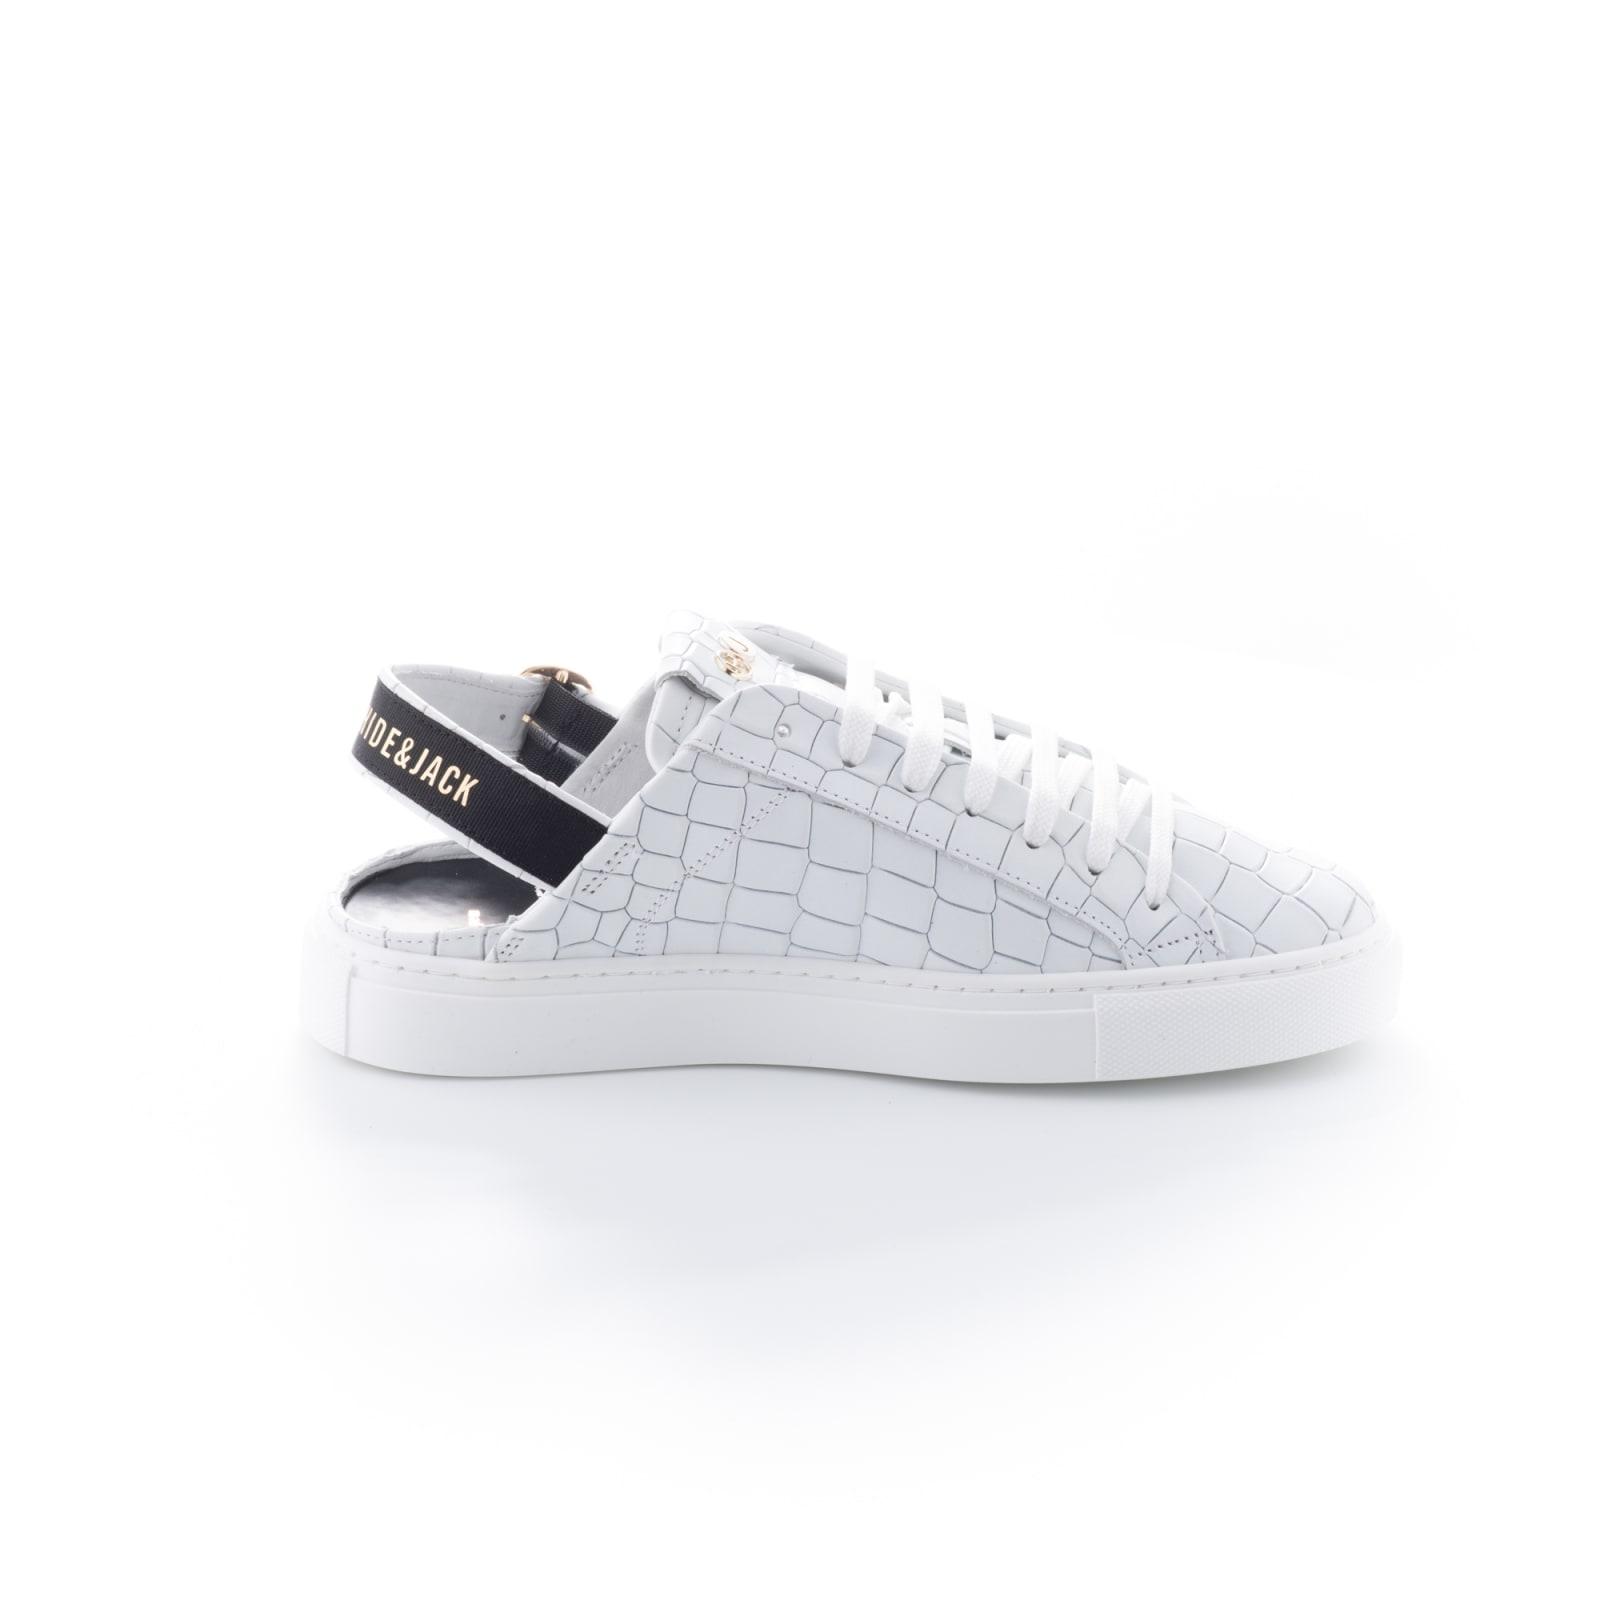 Hide & Jack Sabot White White Sneakers